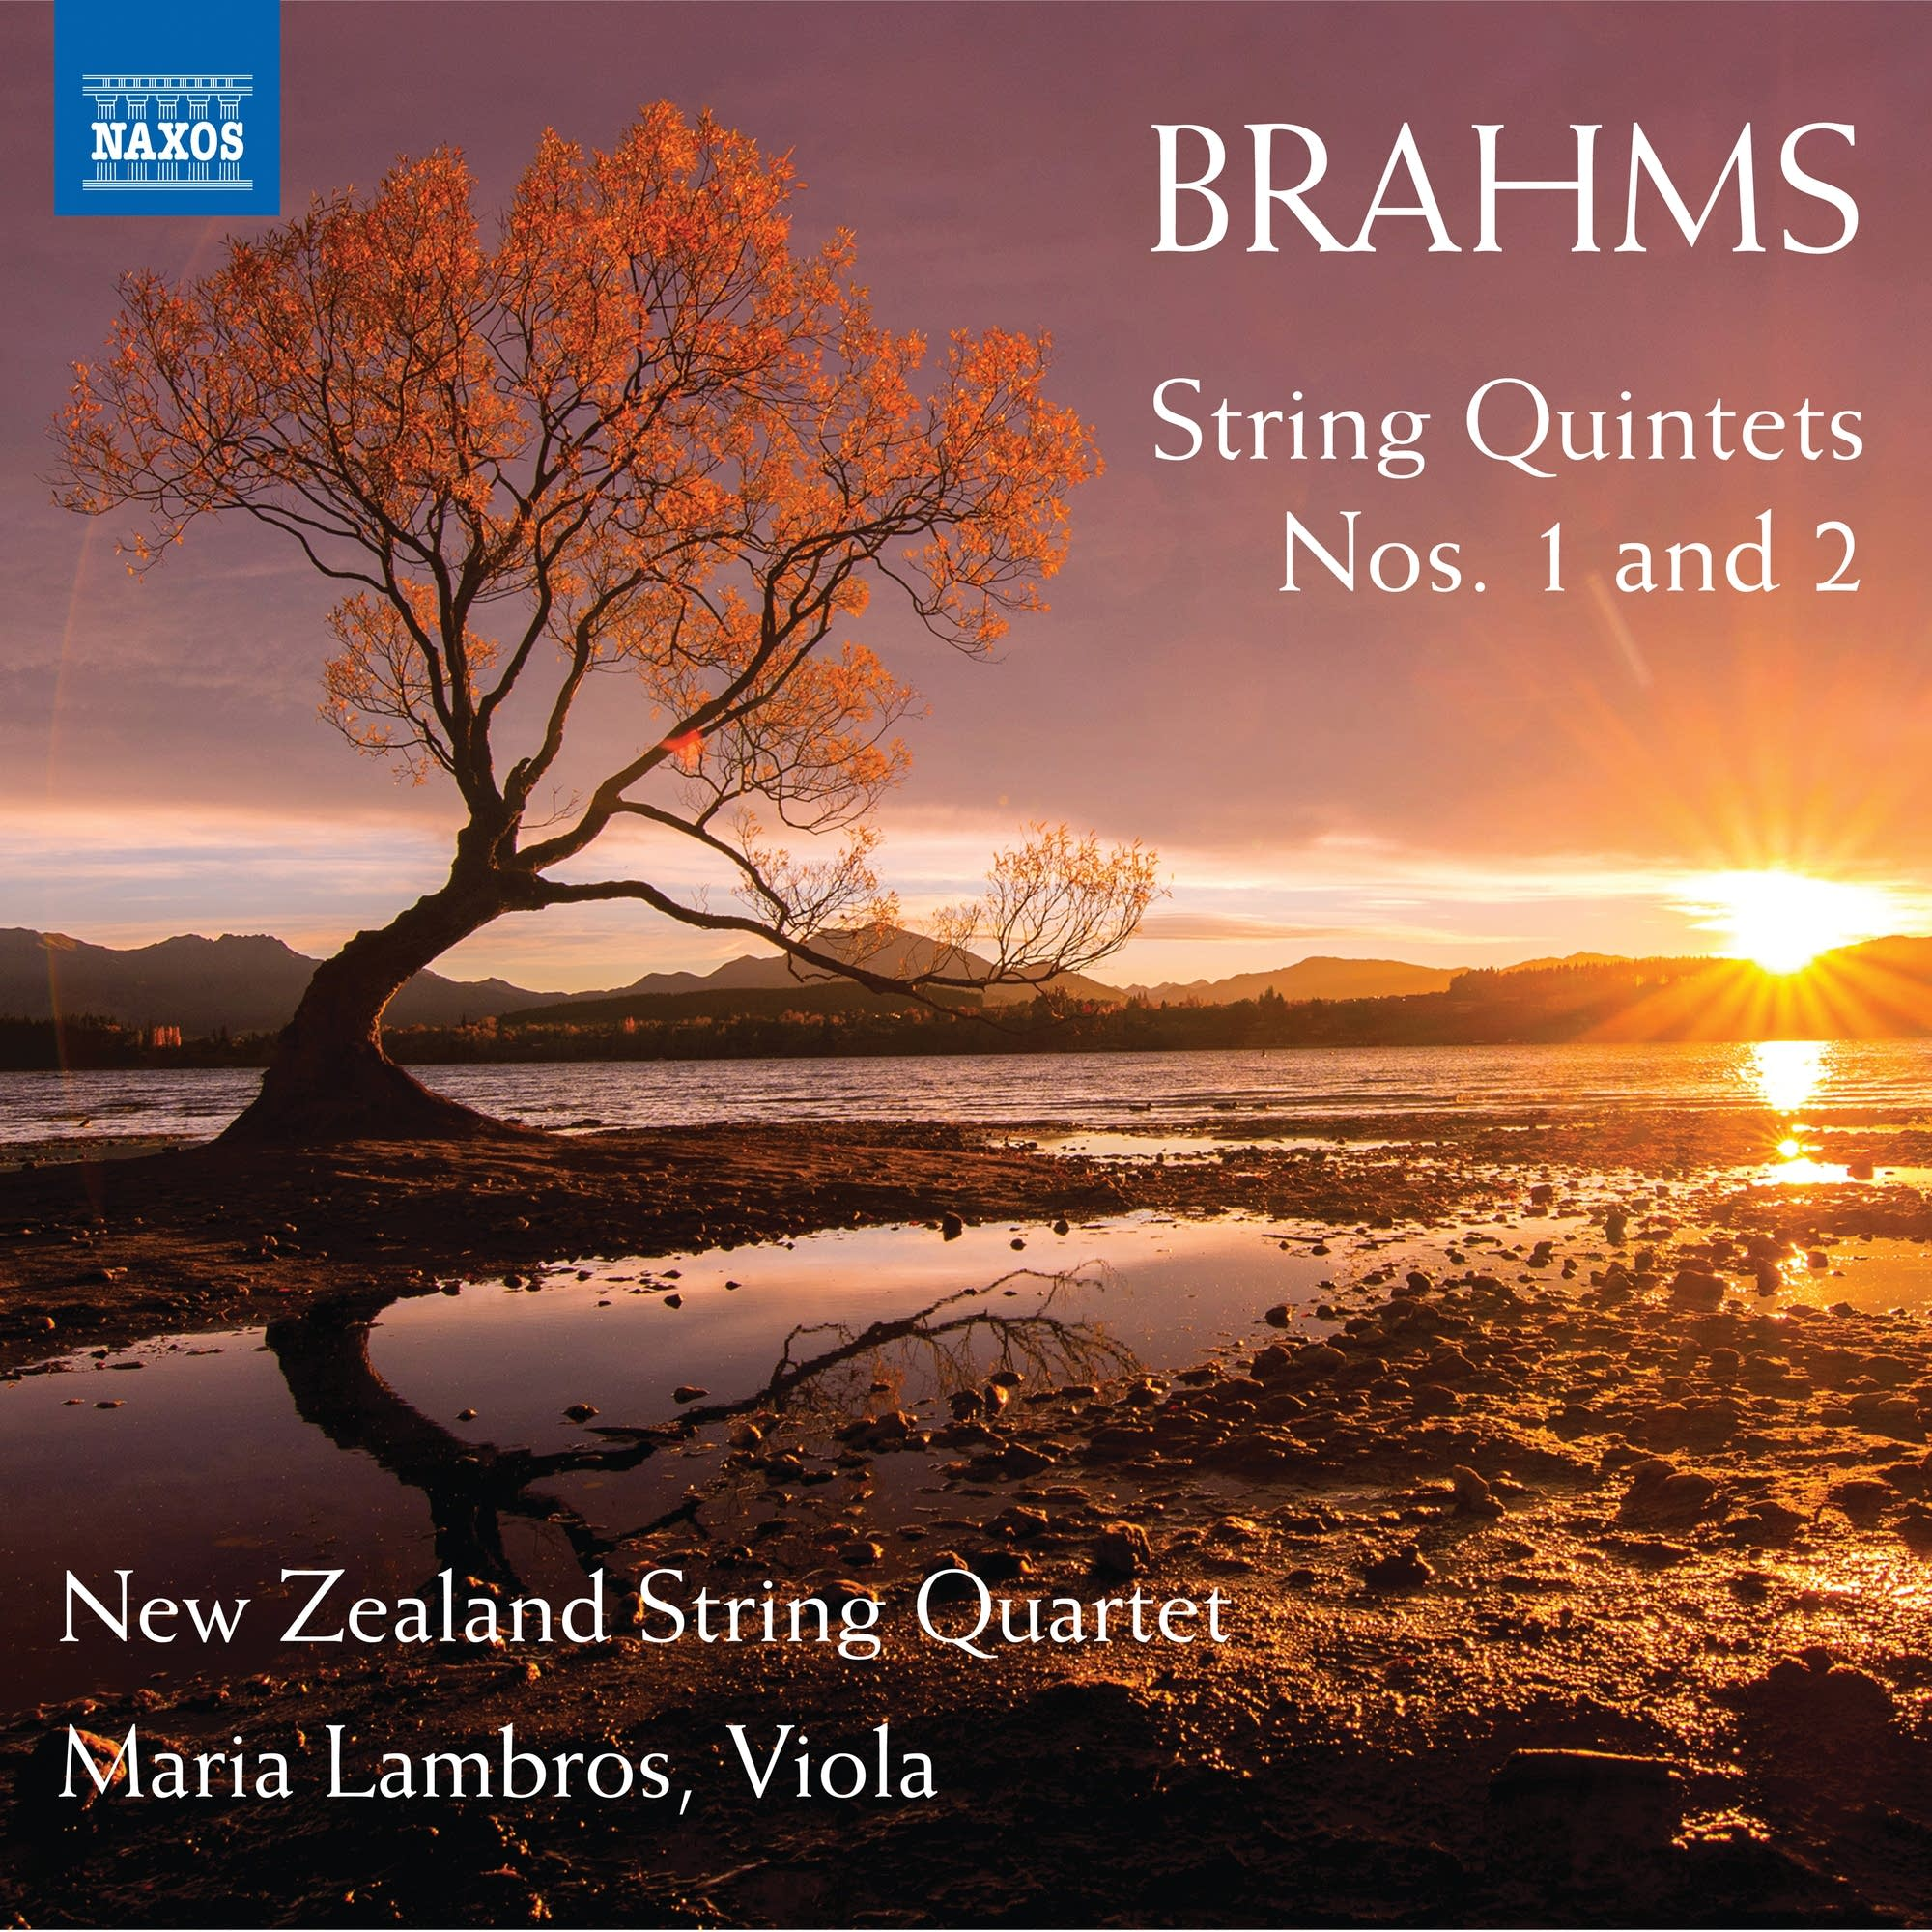 Johannes Brahms - String Quintet No. 2: IV. Vivace ma non troppo presto